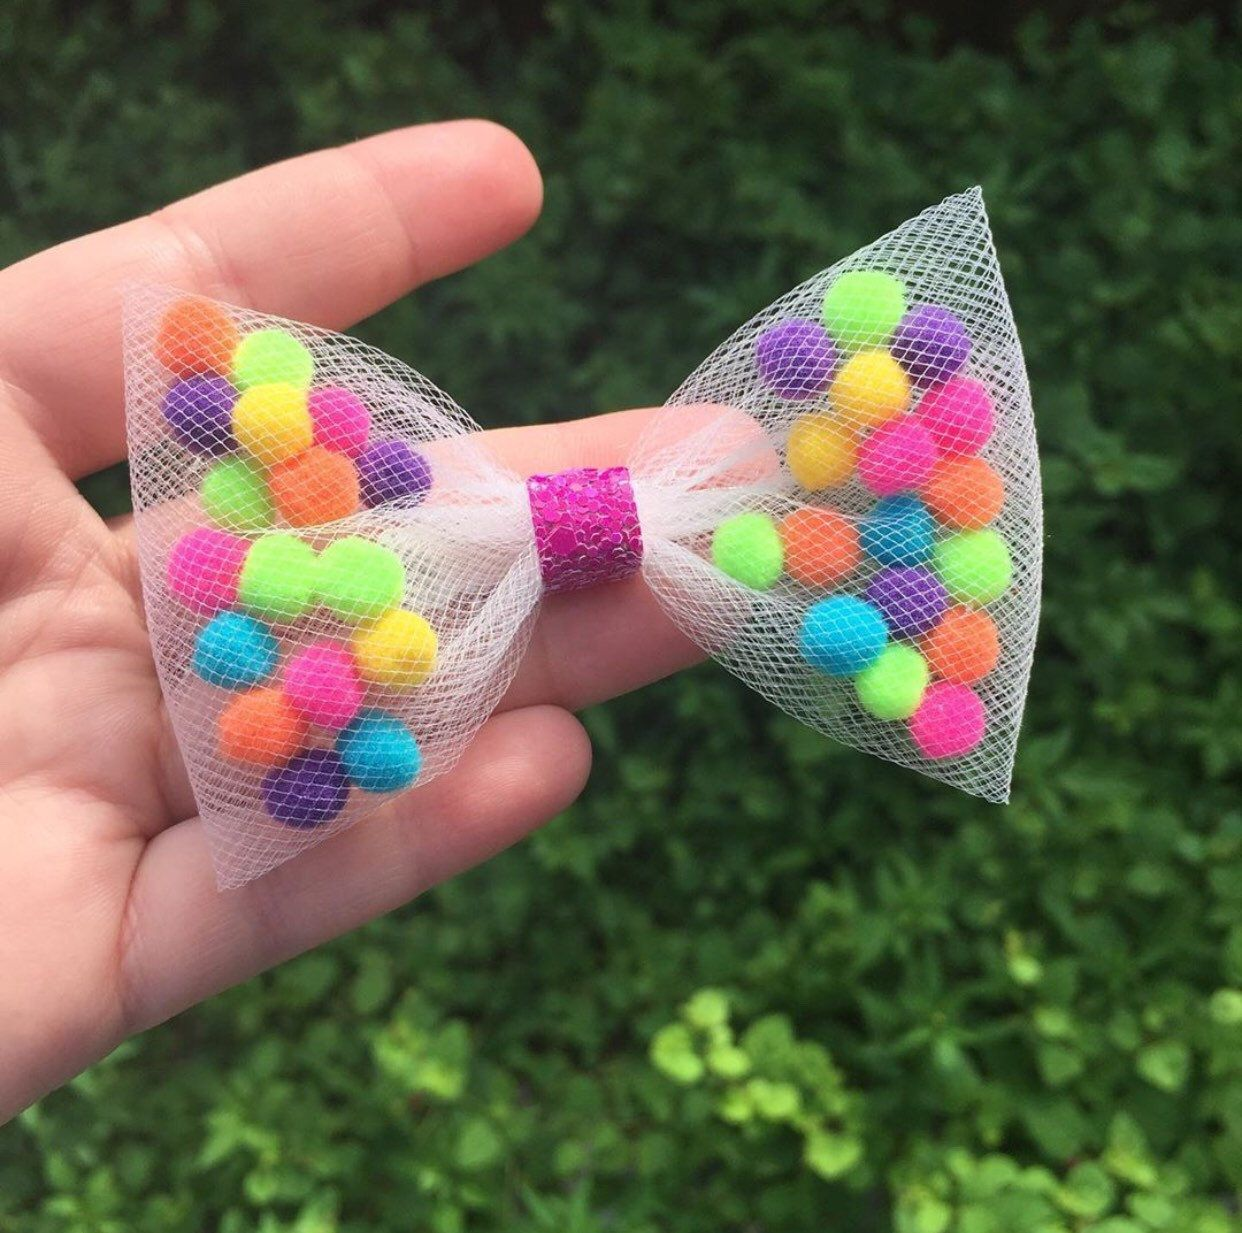 Pom Pom hair bows, kids Pom Pom hair clip, Pom Pom pig tail bows, Tulle hair bows , rainbow Pom Pom bow , Girl hair bow, Fun hair bow, Gift